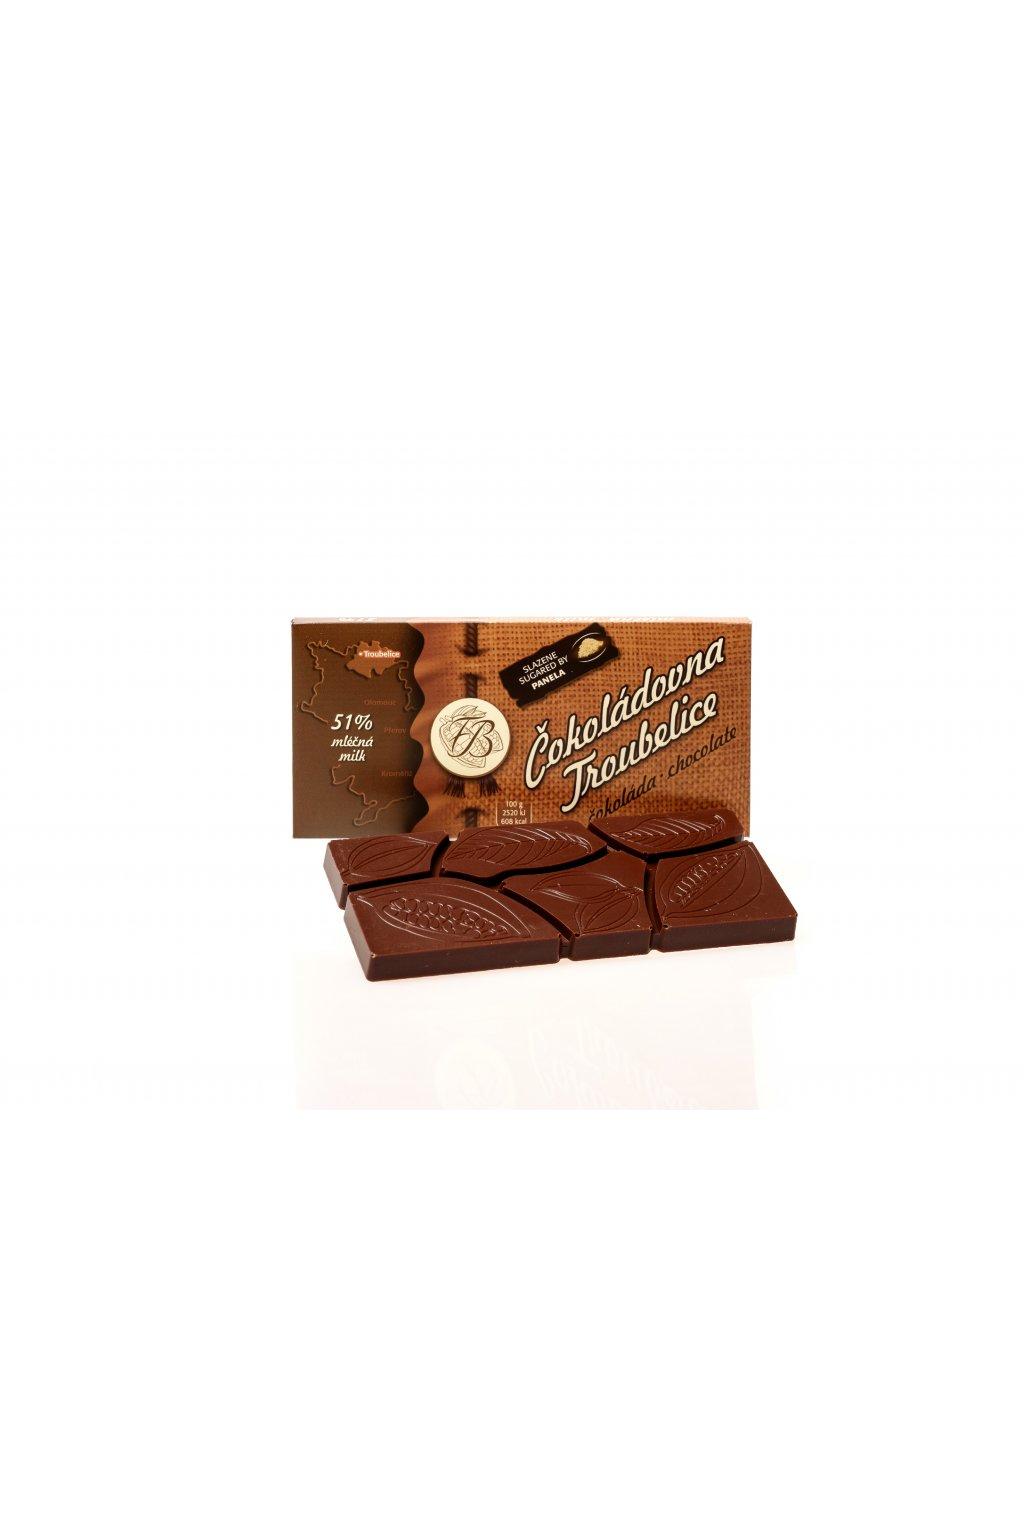 Cokoladovna troubelice 1